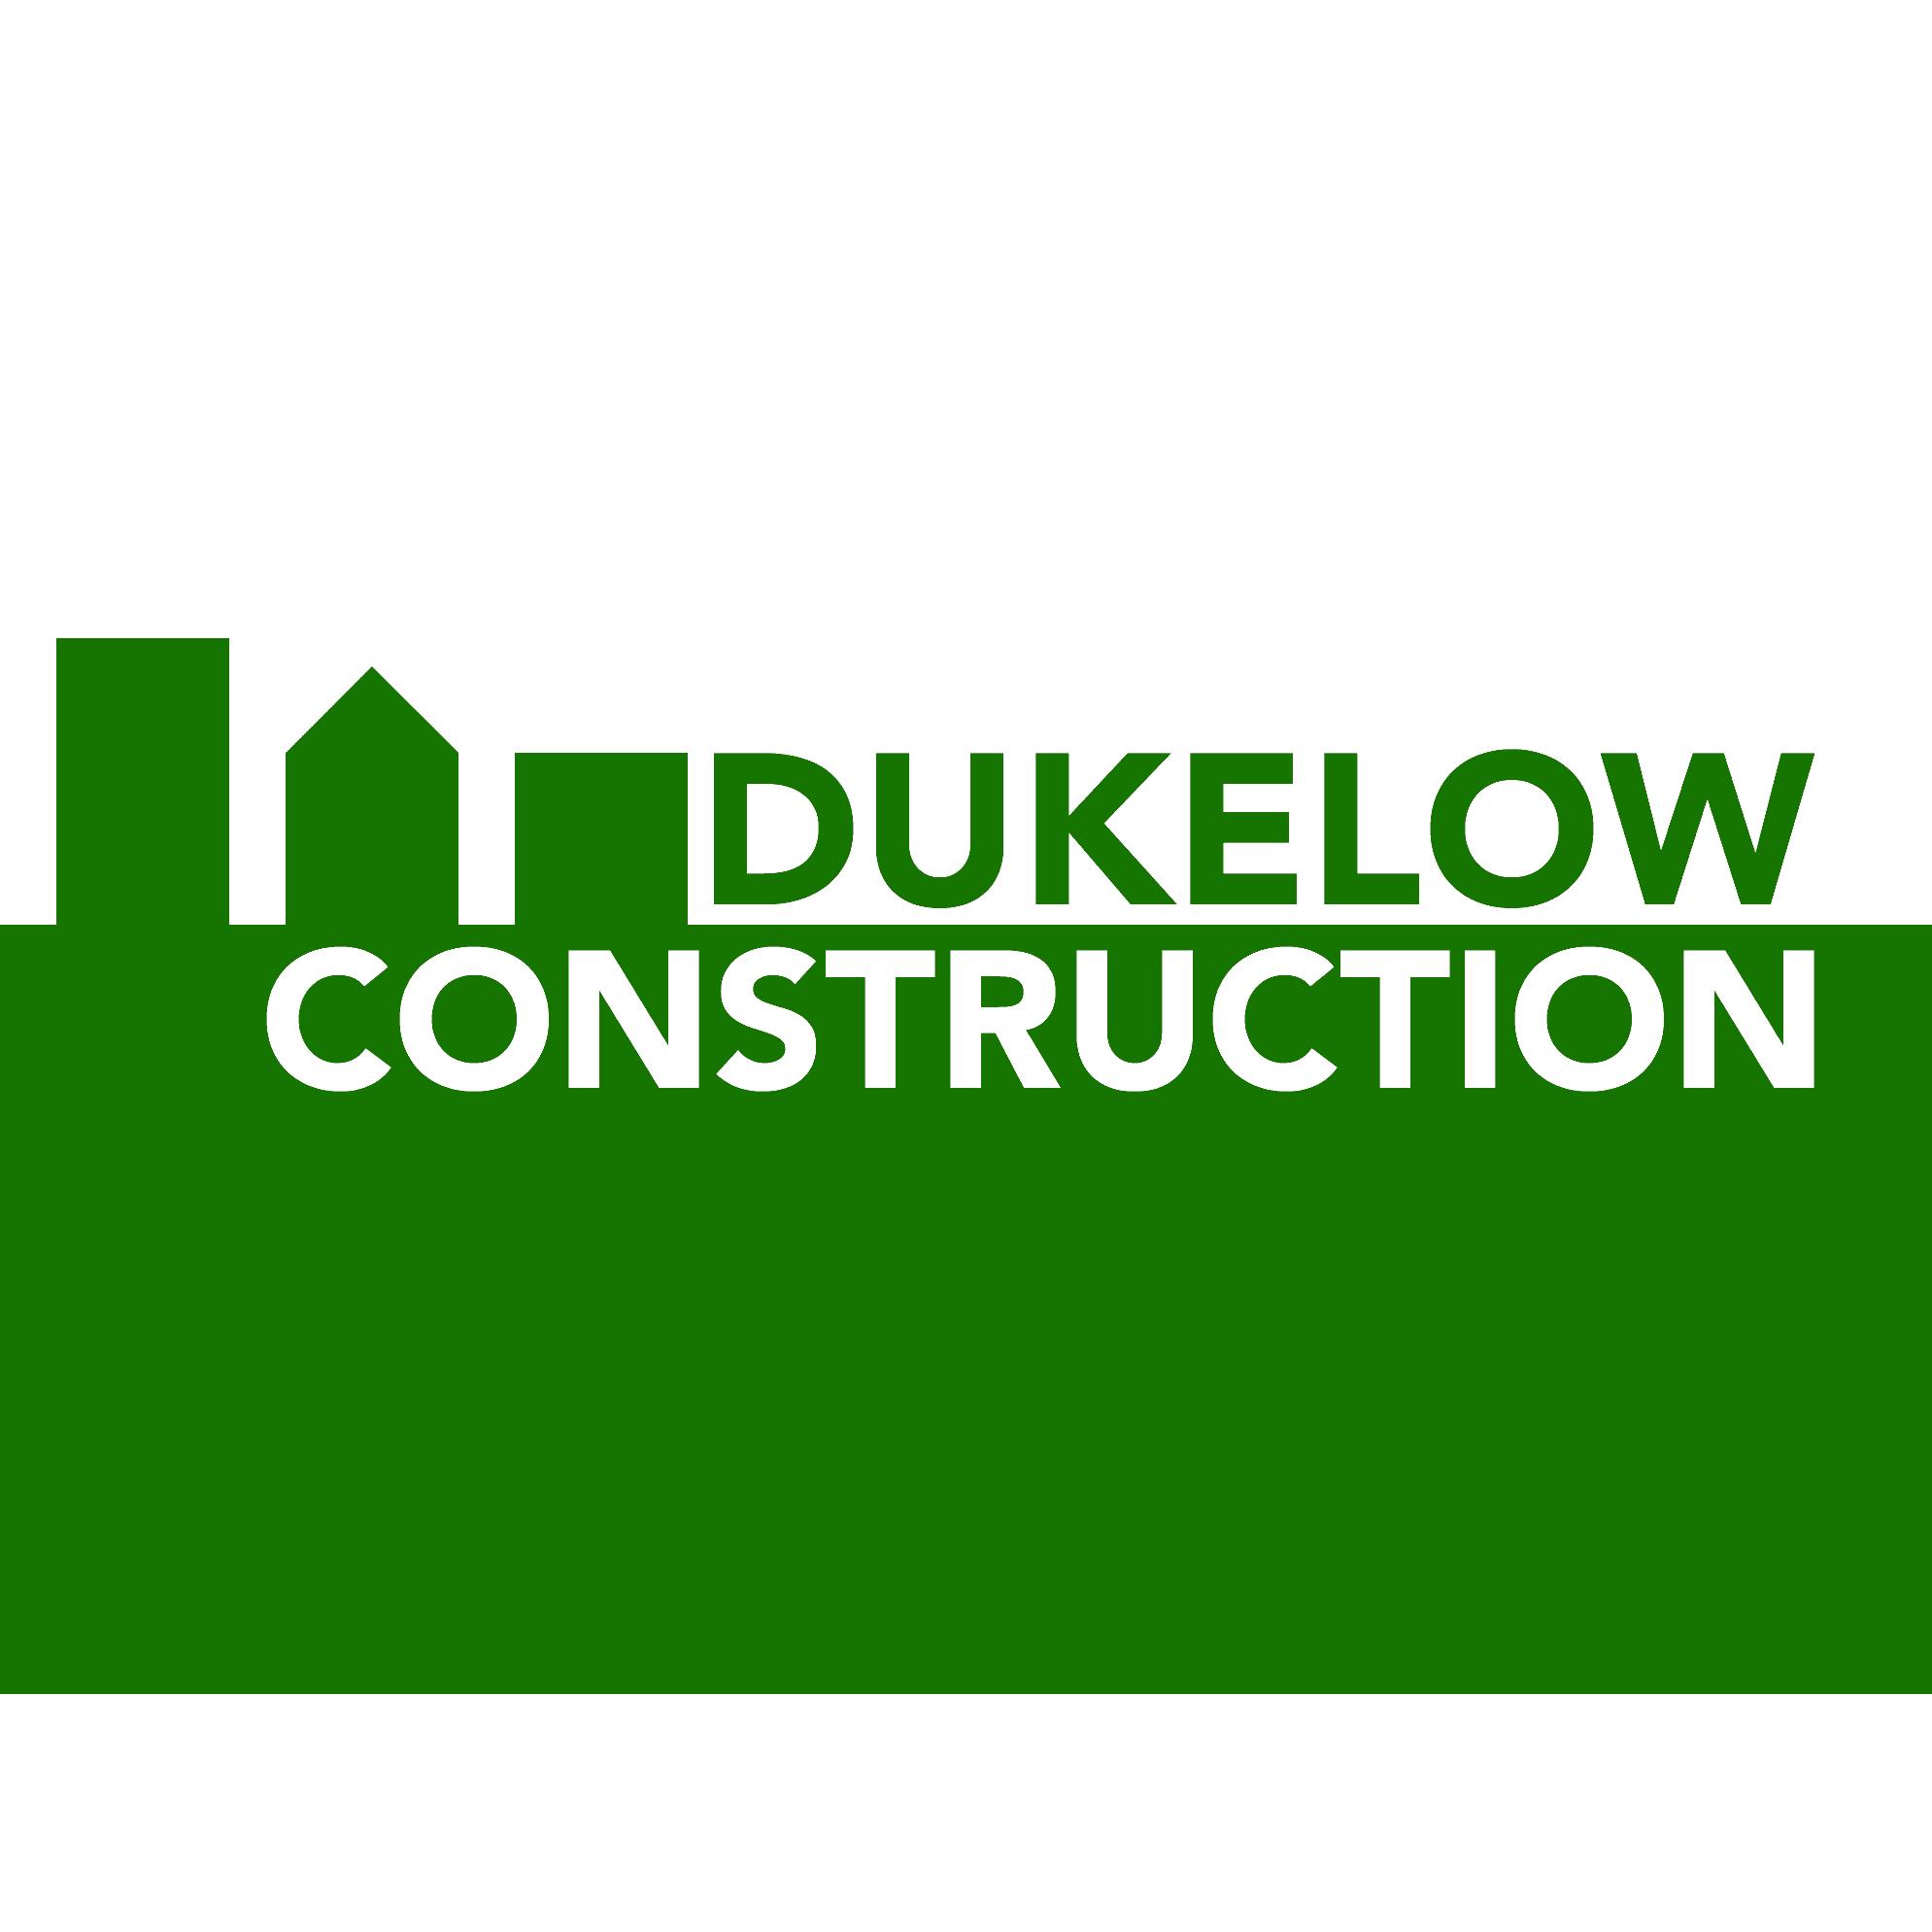 Dukelow Construction Ltd